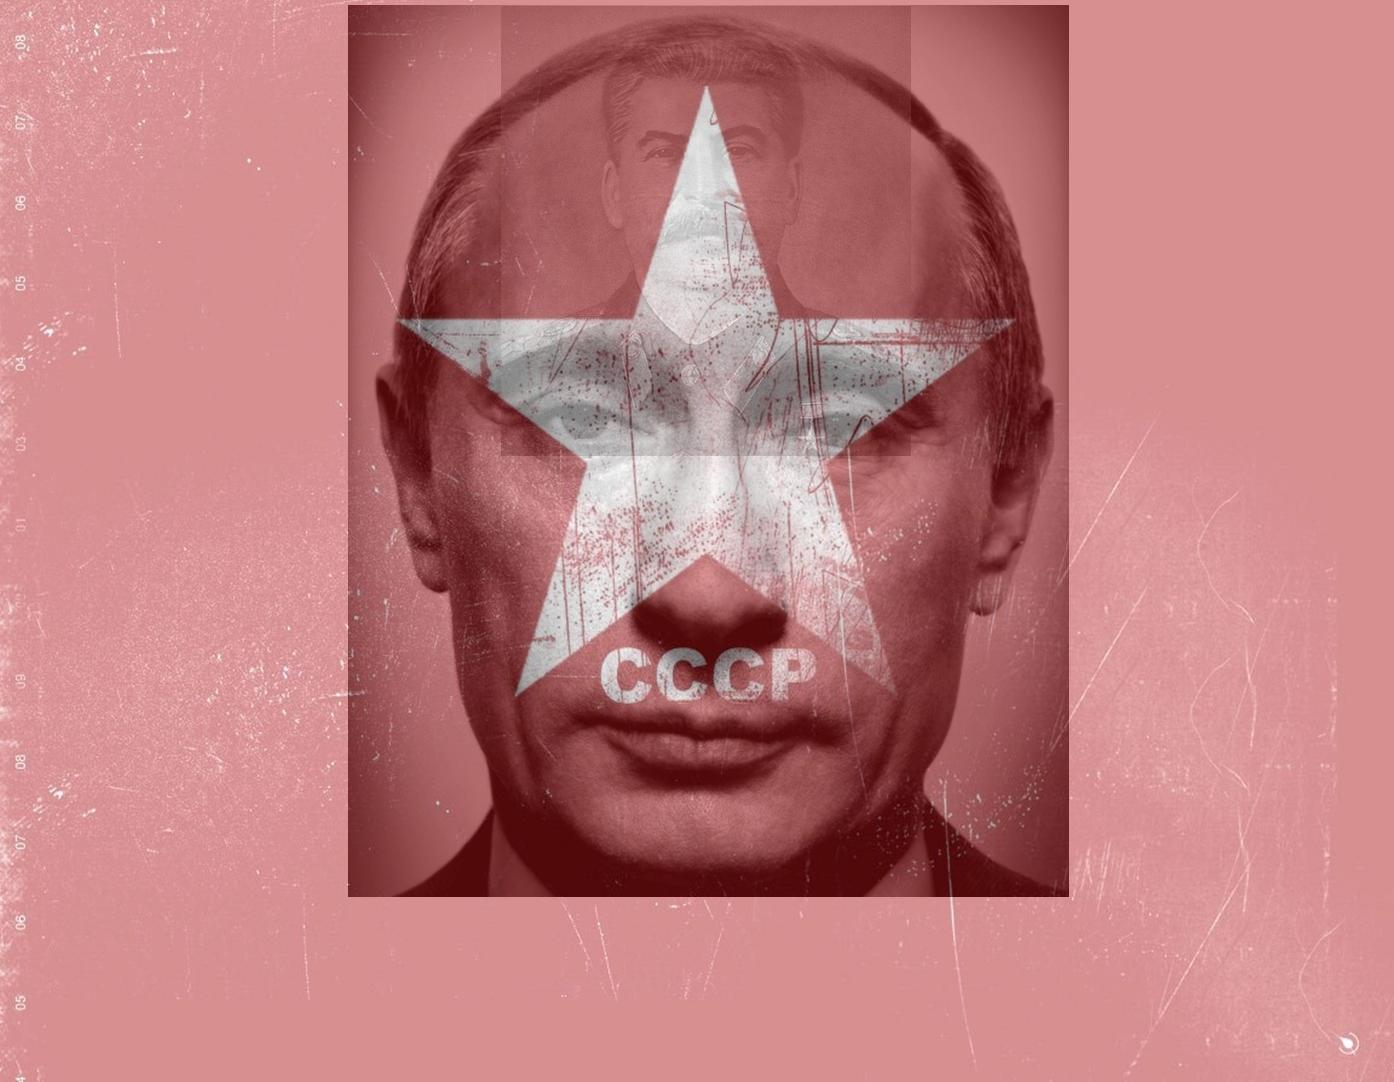 http://3.bp.blogspot.com/-EzSglIWxHBA/UDJJ1YAuEBI/AAAAAAAAAuw/8ujhZx6OuJs/s1600/russia_vladimir_putin_profile_desktop_1440x900_wallpaper-368427.jpg